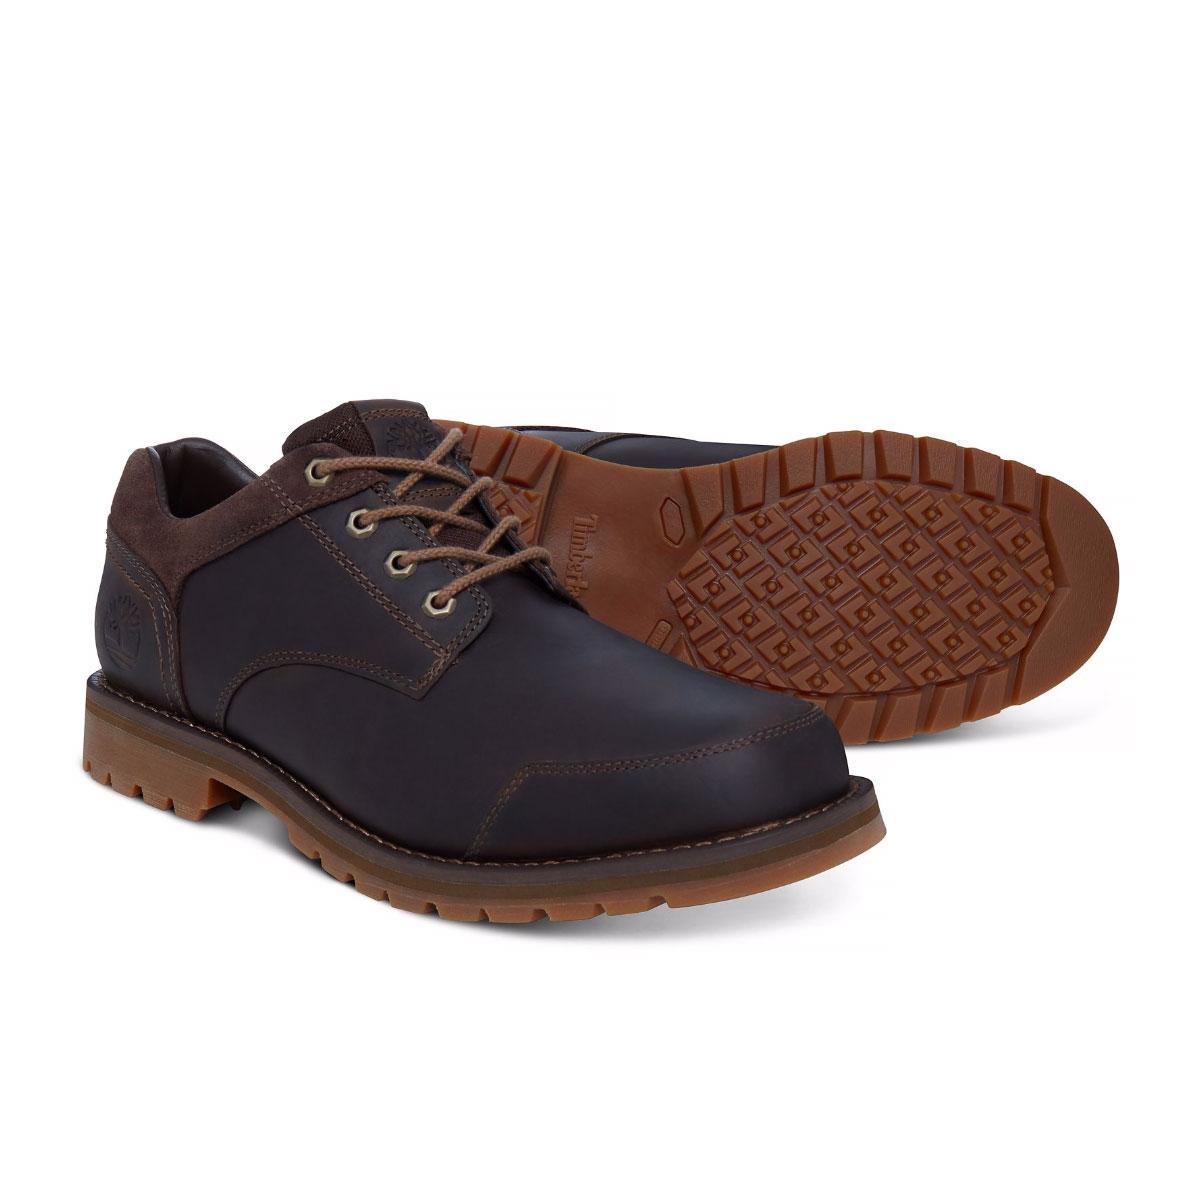 Image of Timberland Earthkeepers Larchmont Oxford Shoe (Men's) - Gaucho  Saddleback (Dark Brown